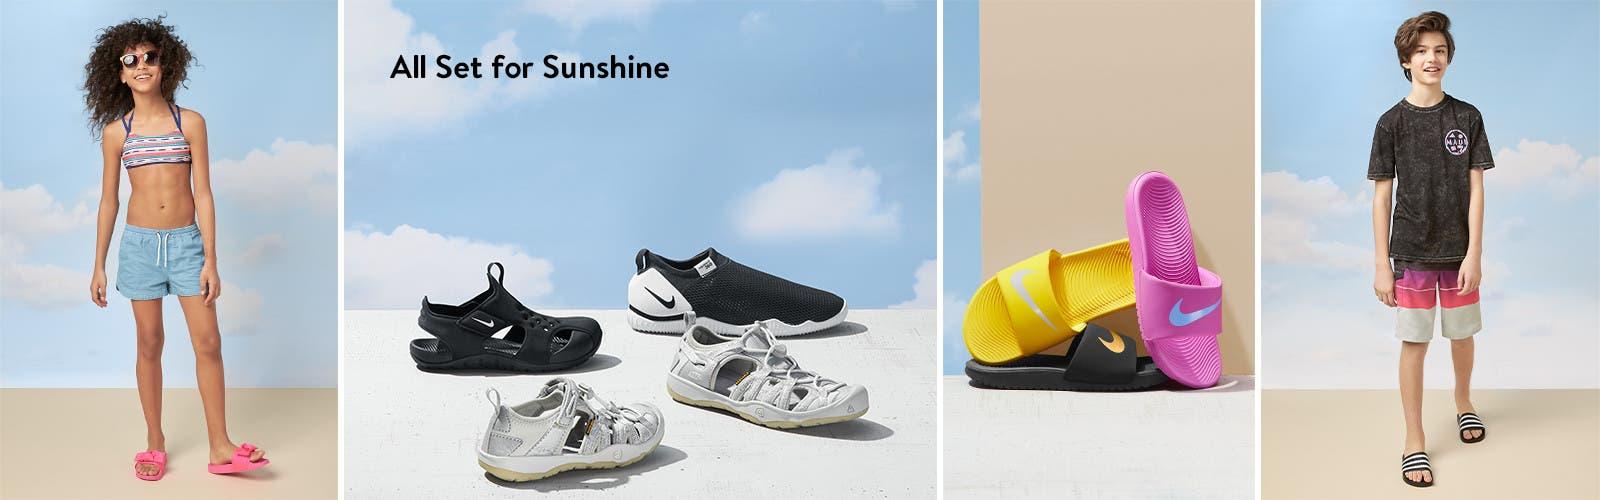 Kids' shoes all set for sunshine.